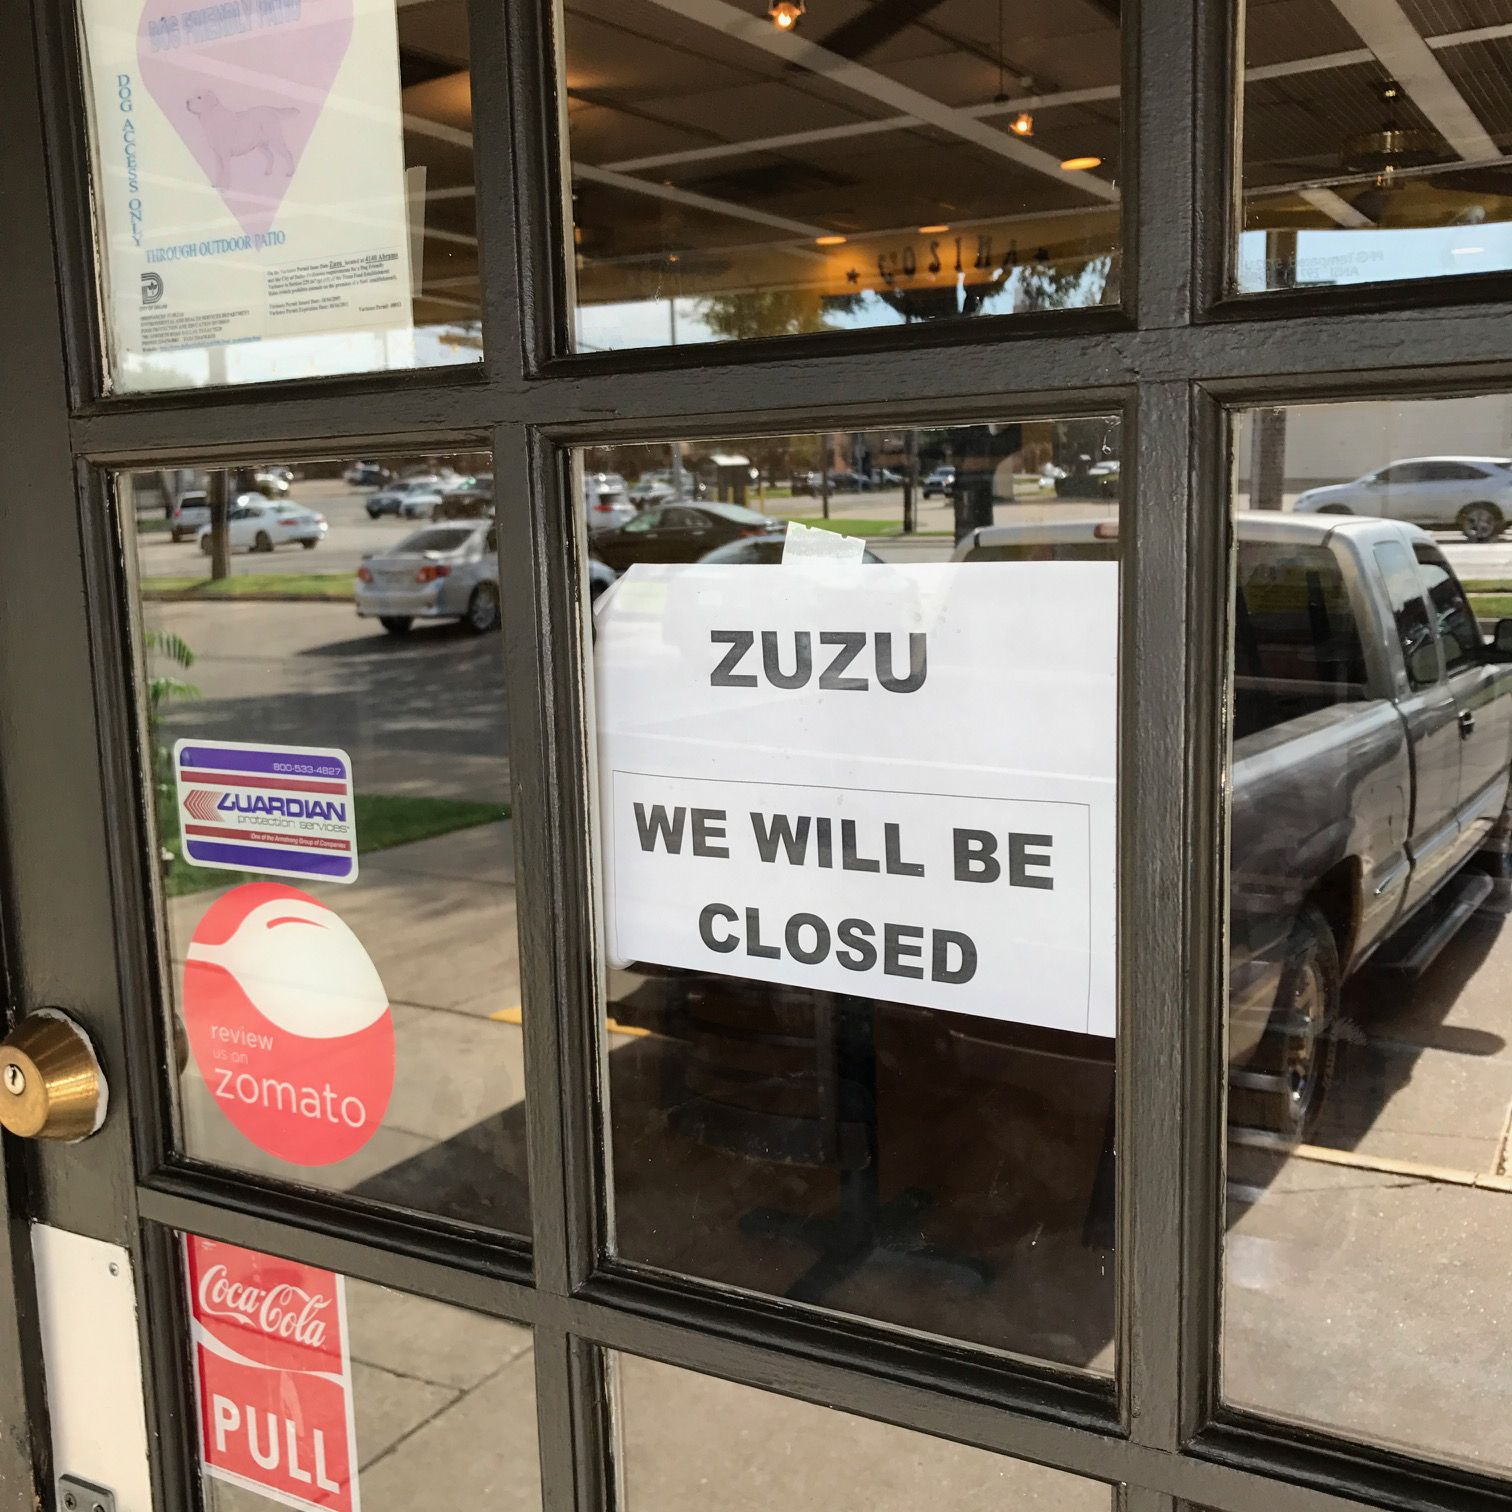 Zuzu in Dallas has closed as of July 23.